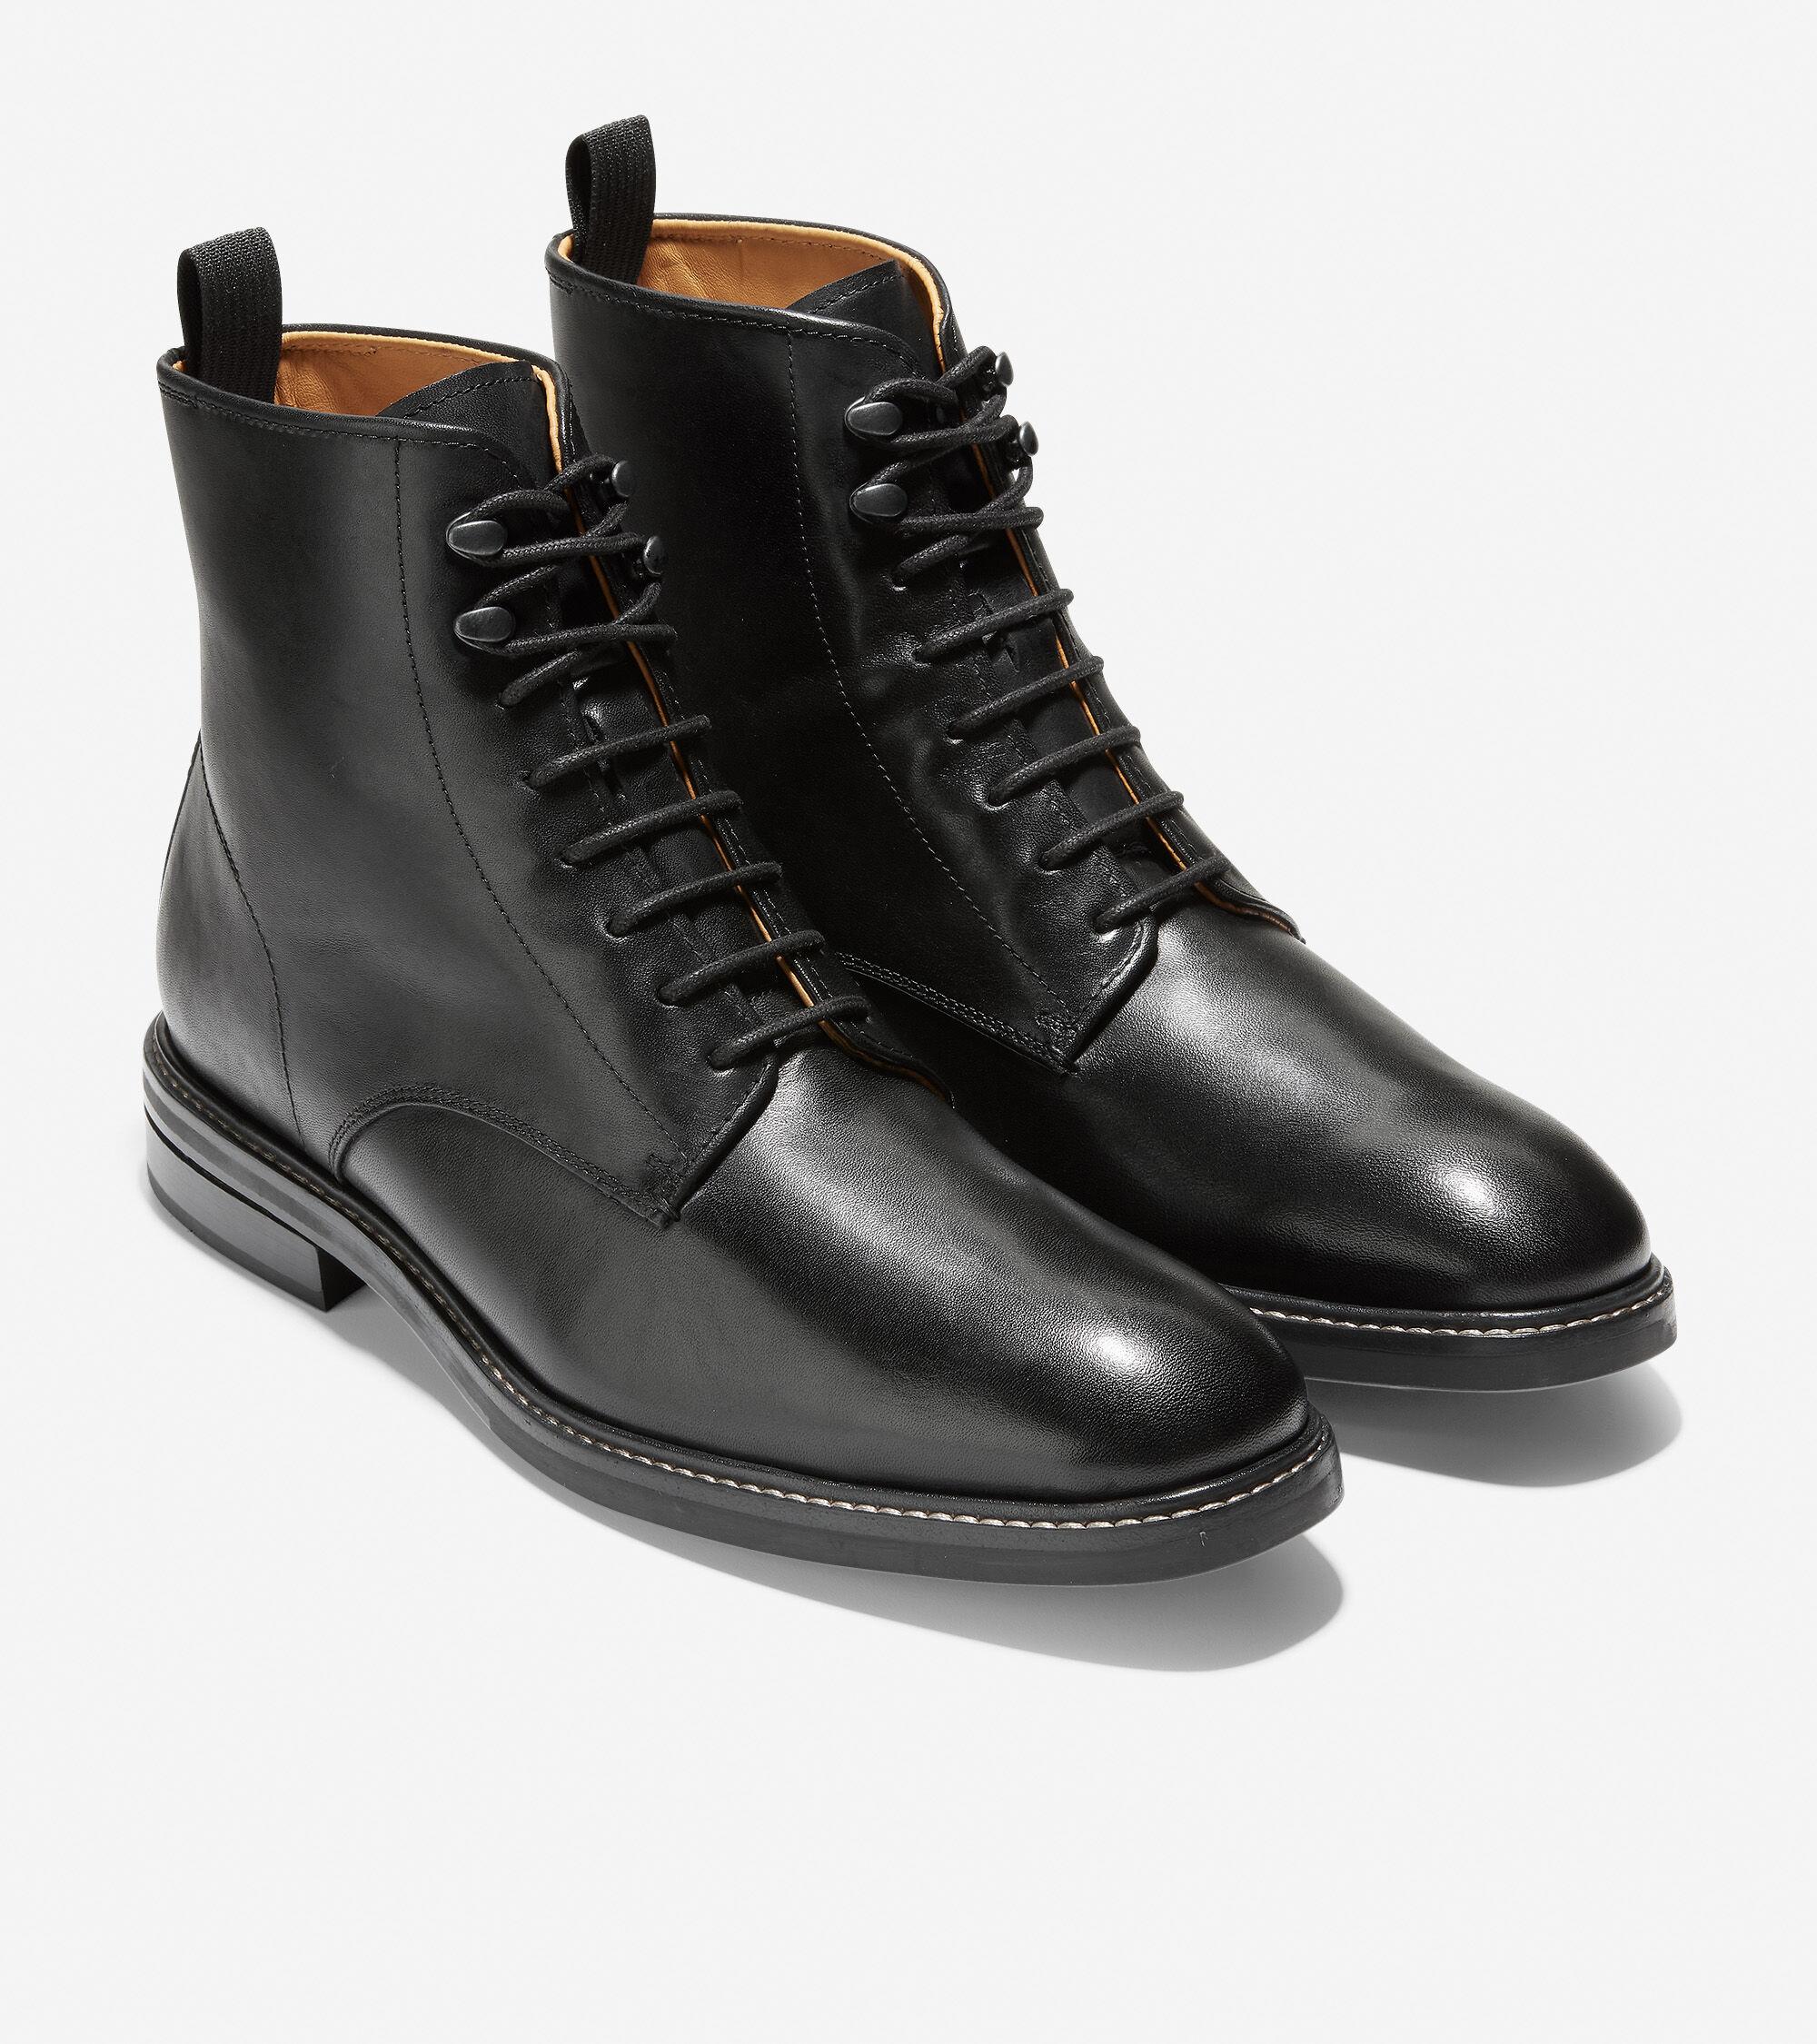 Wagner Grand Plain Toe Boot in Black